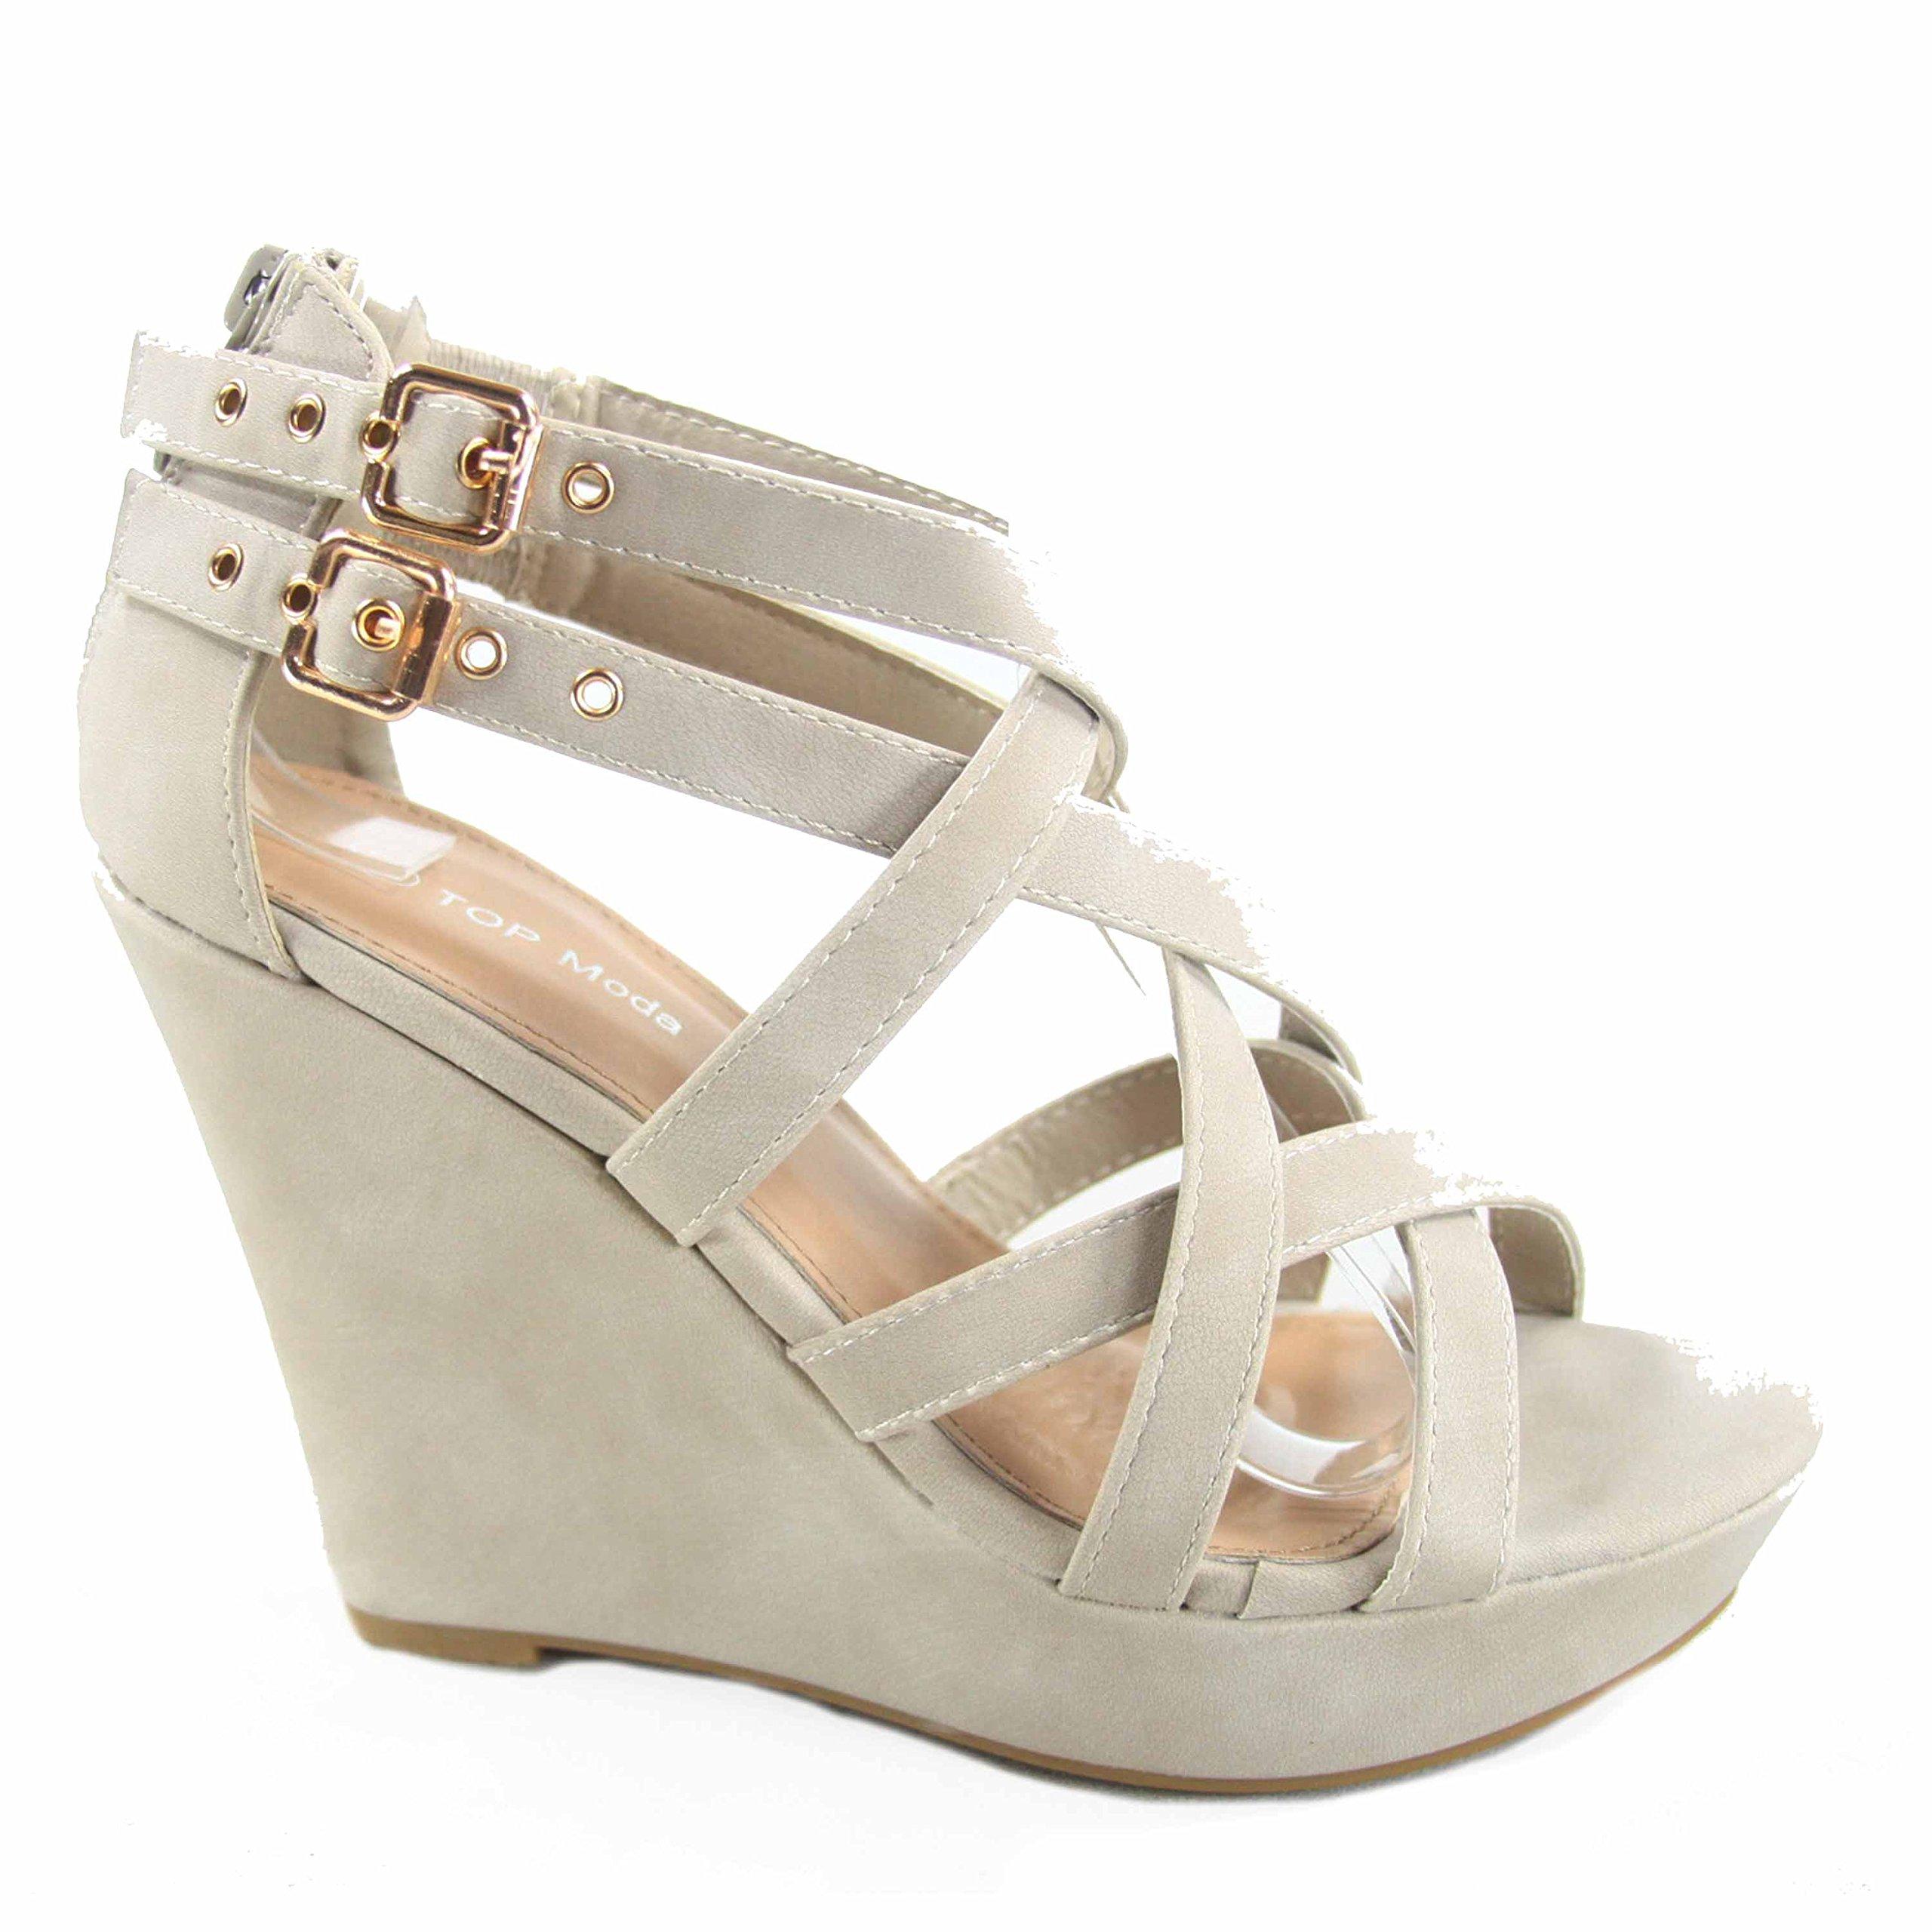 Top Moda Jessie-1 Women's Fashion Strappy Double Buckles High Wedge Heel Sandal Shoes (9 B(M) US, Beige)